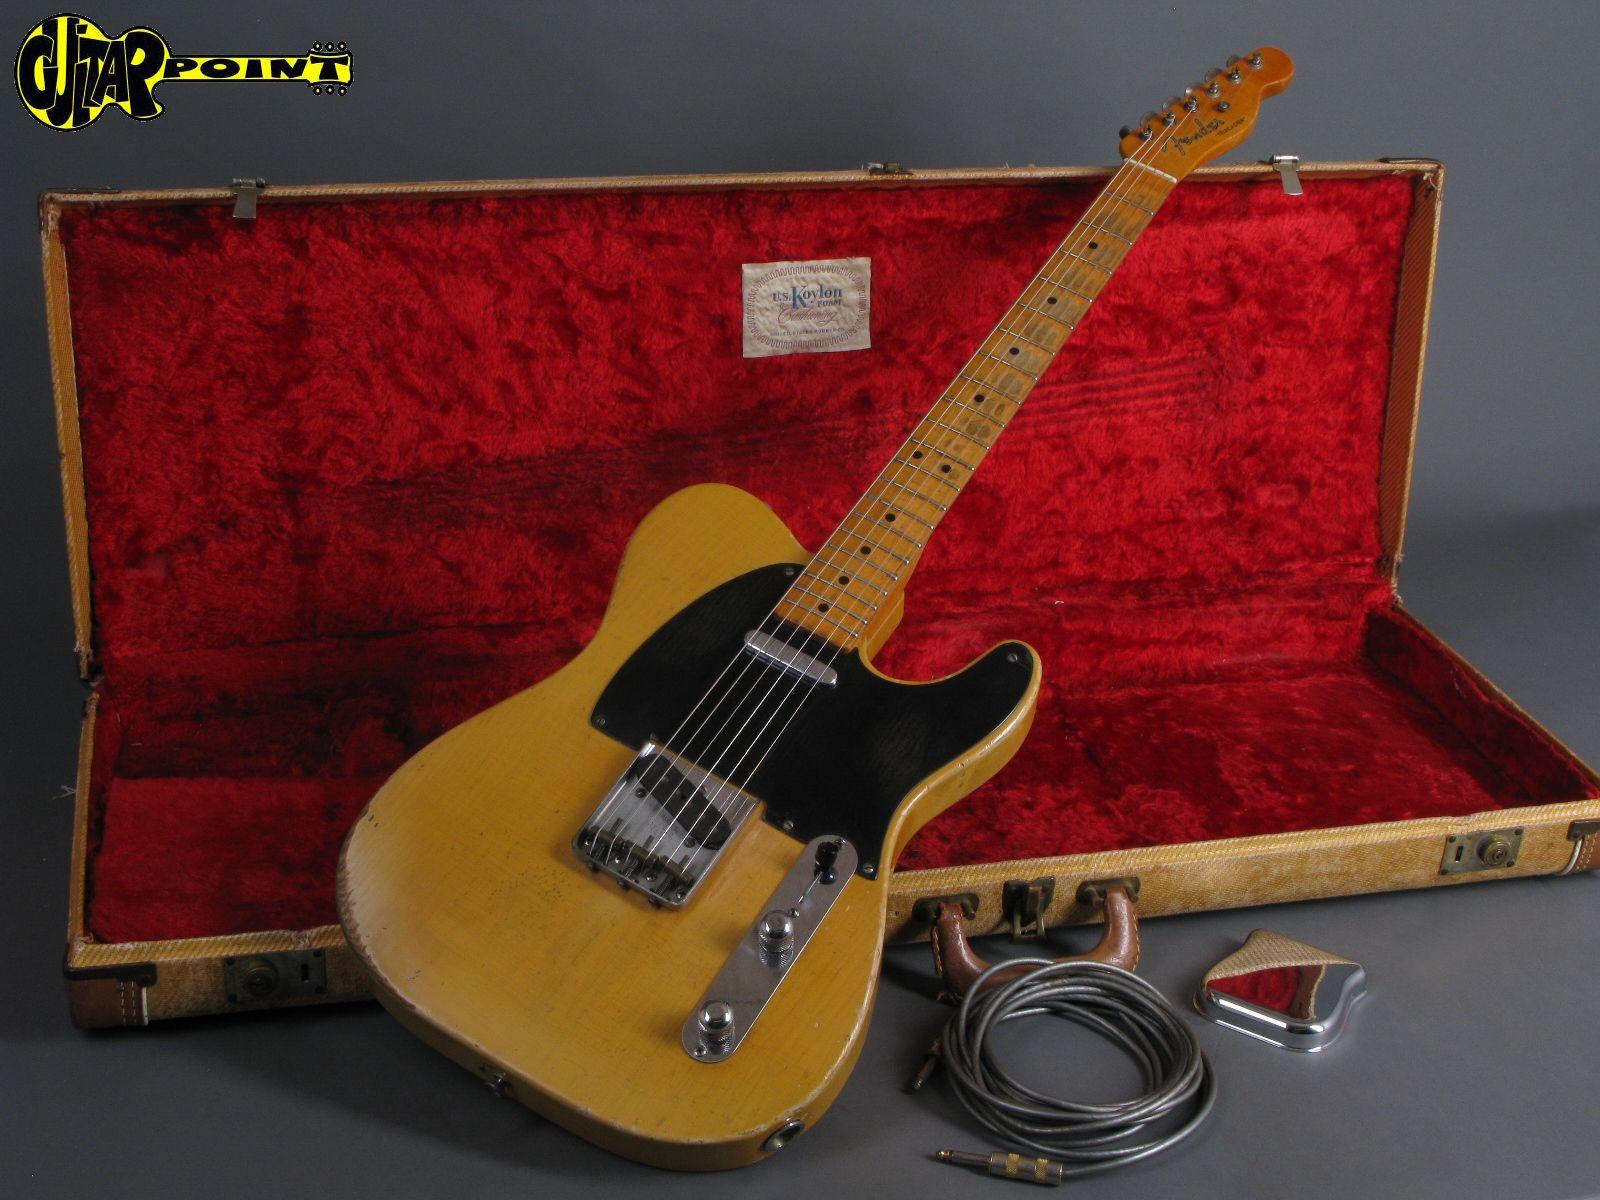 Fender Telecaster 1952 Blond Guitar For Sale Guitarpoint